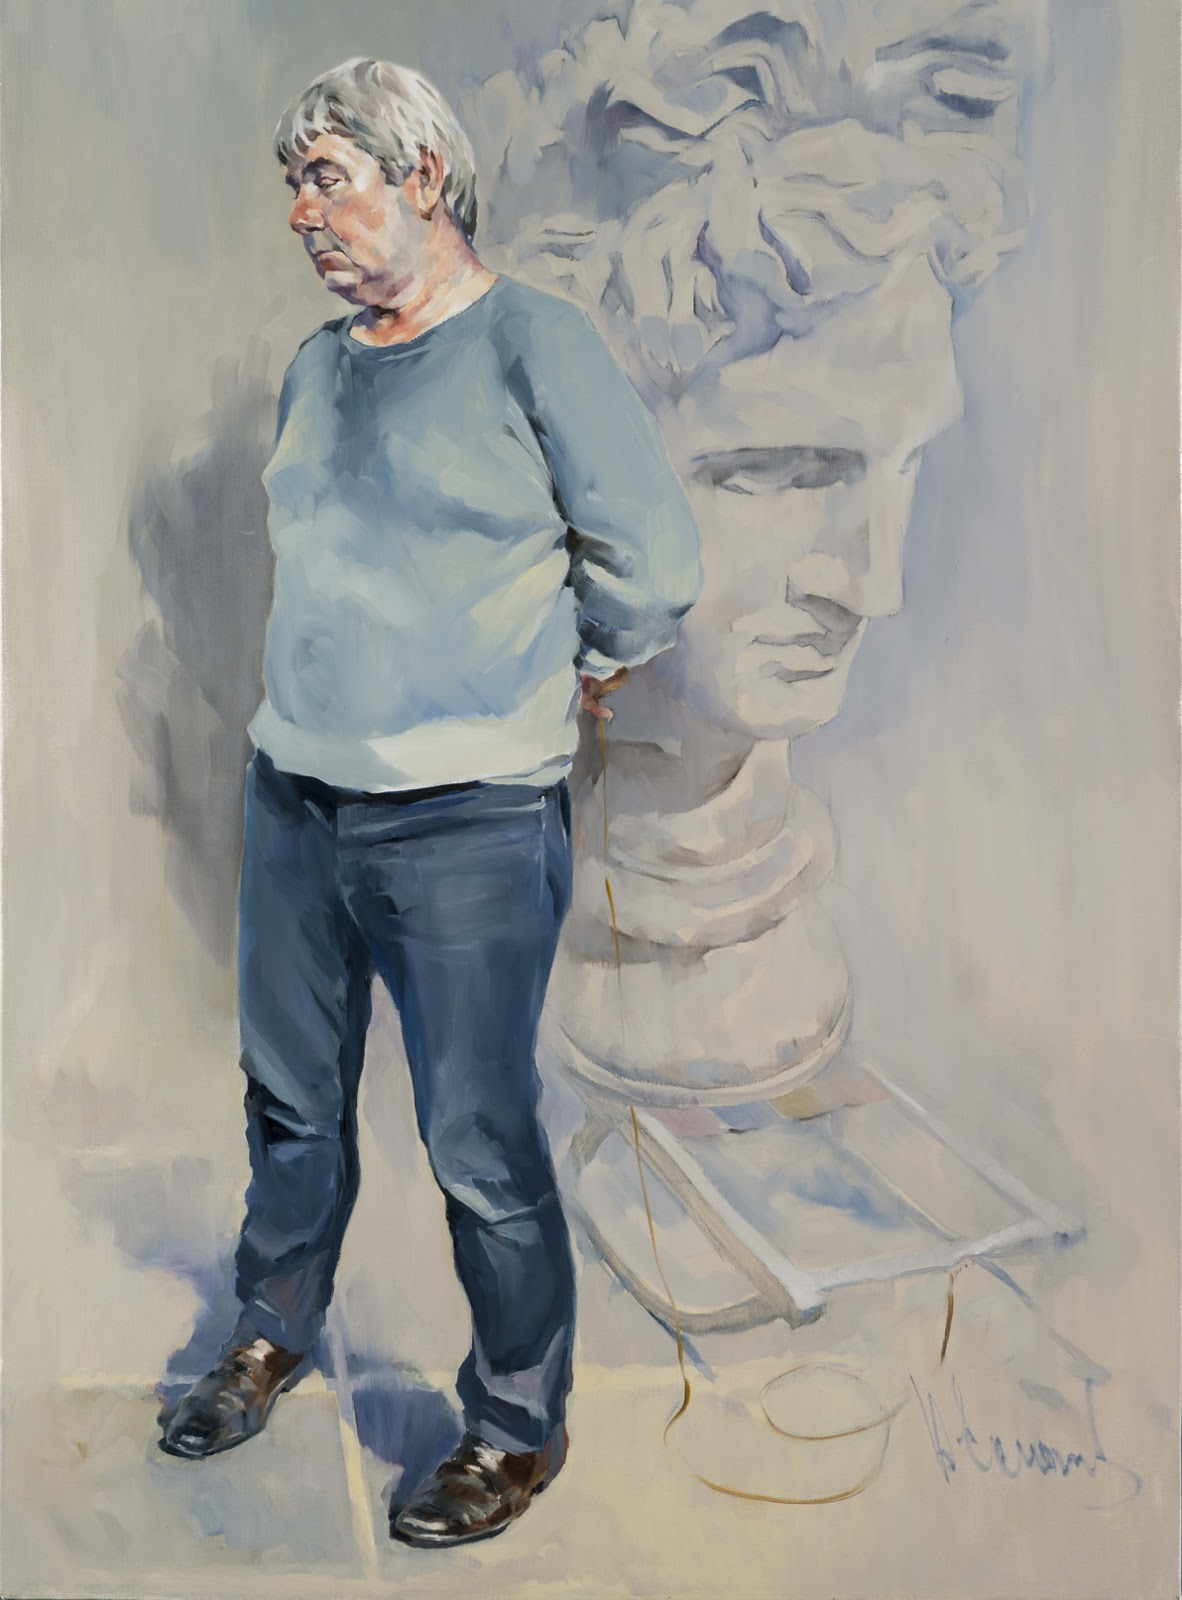 Andrey Esionov Igor Chernoglazov